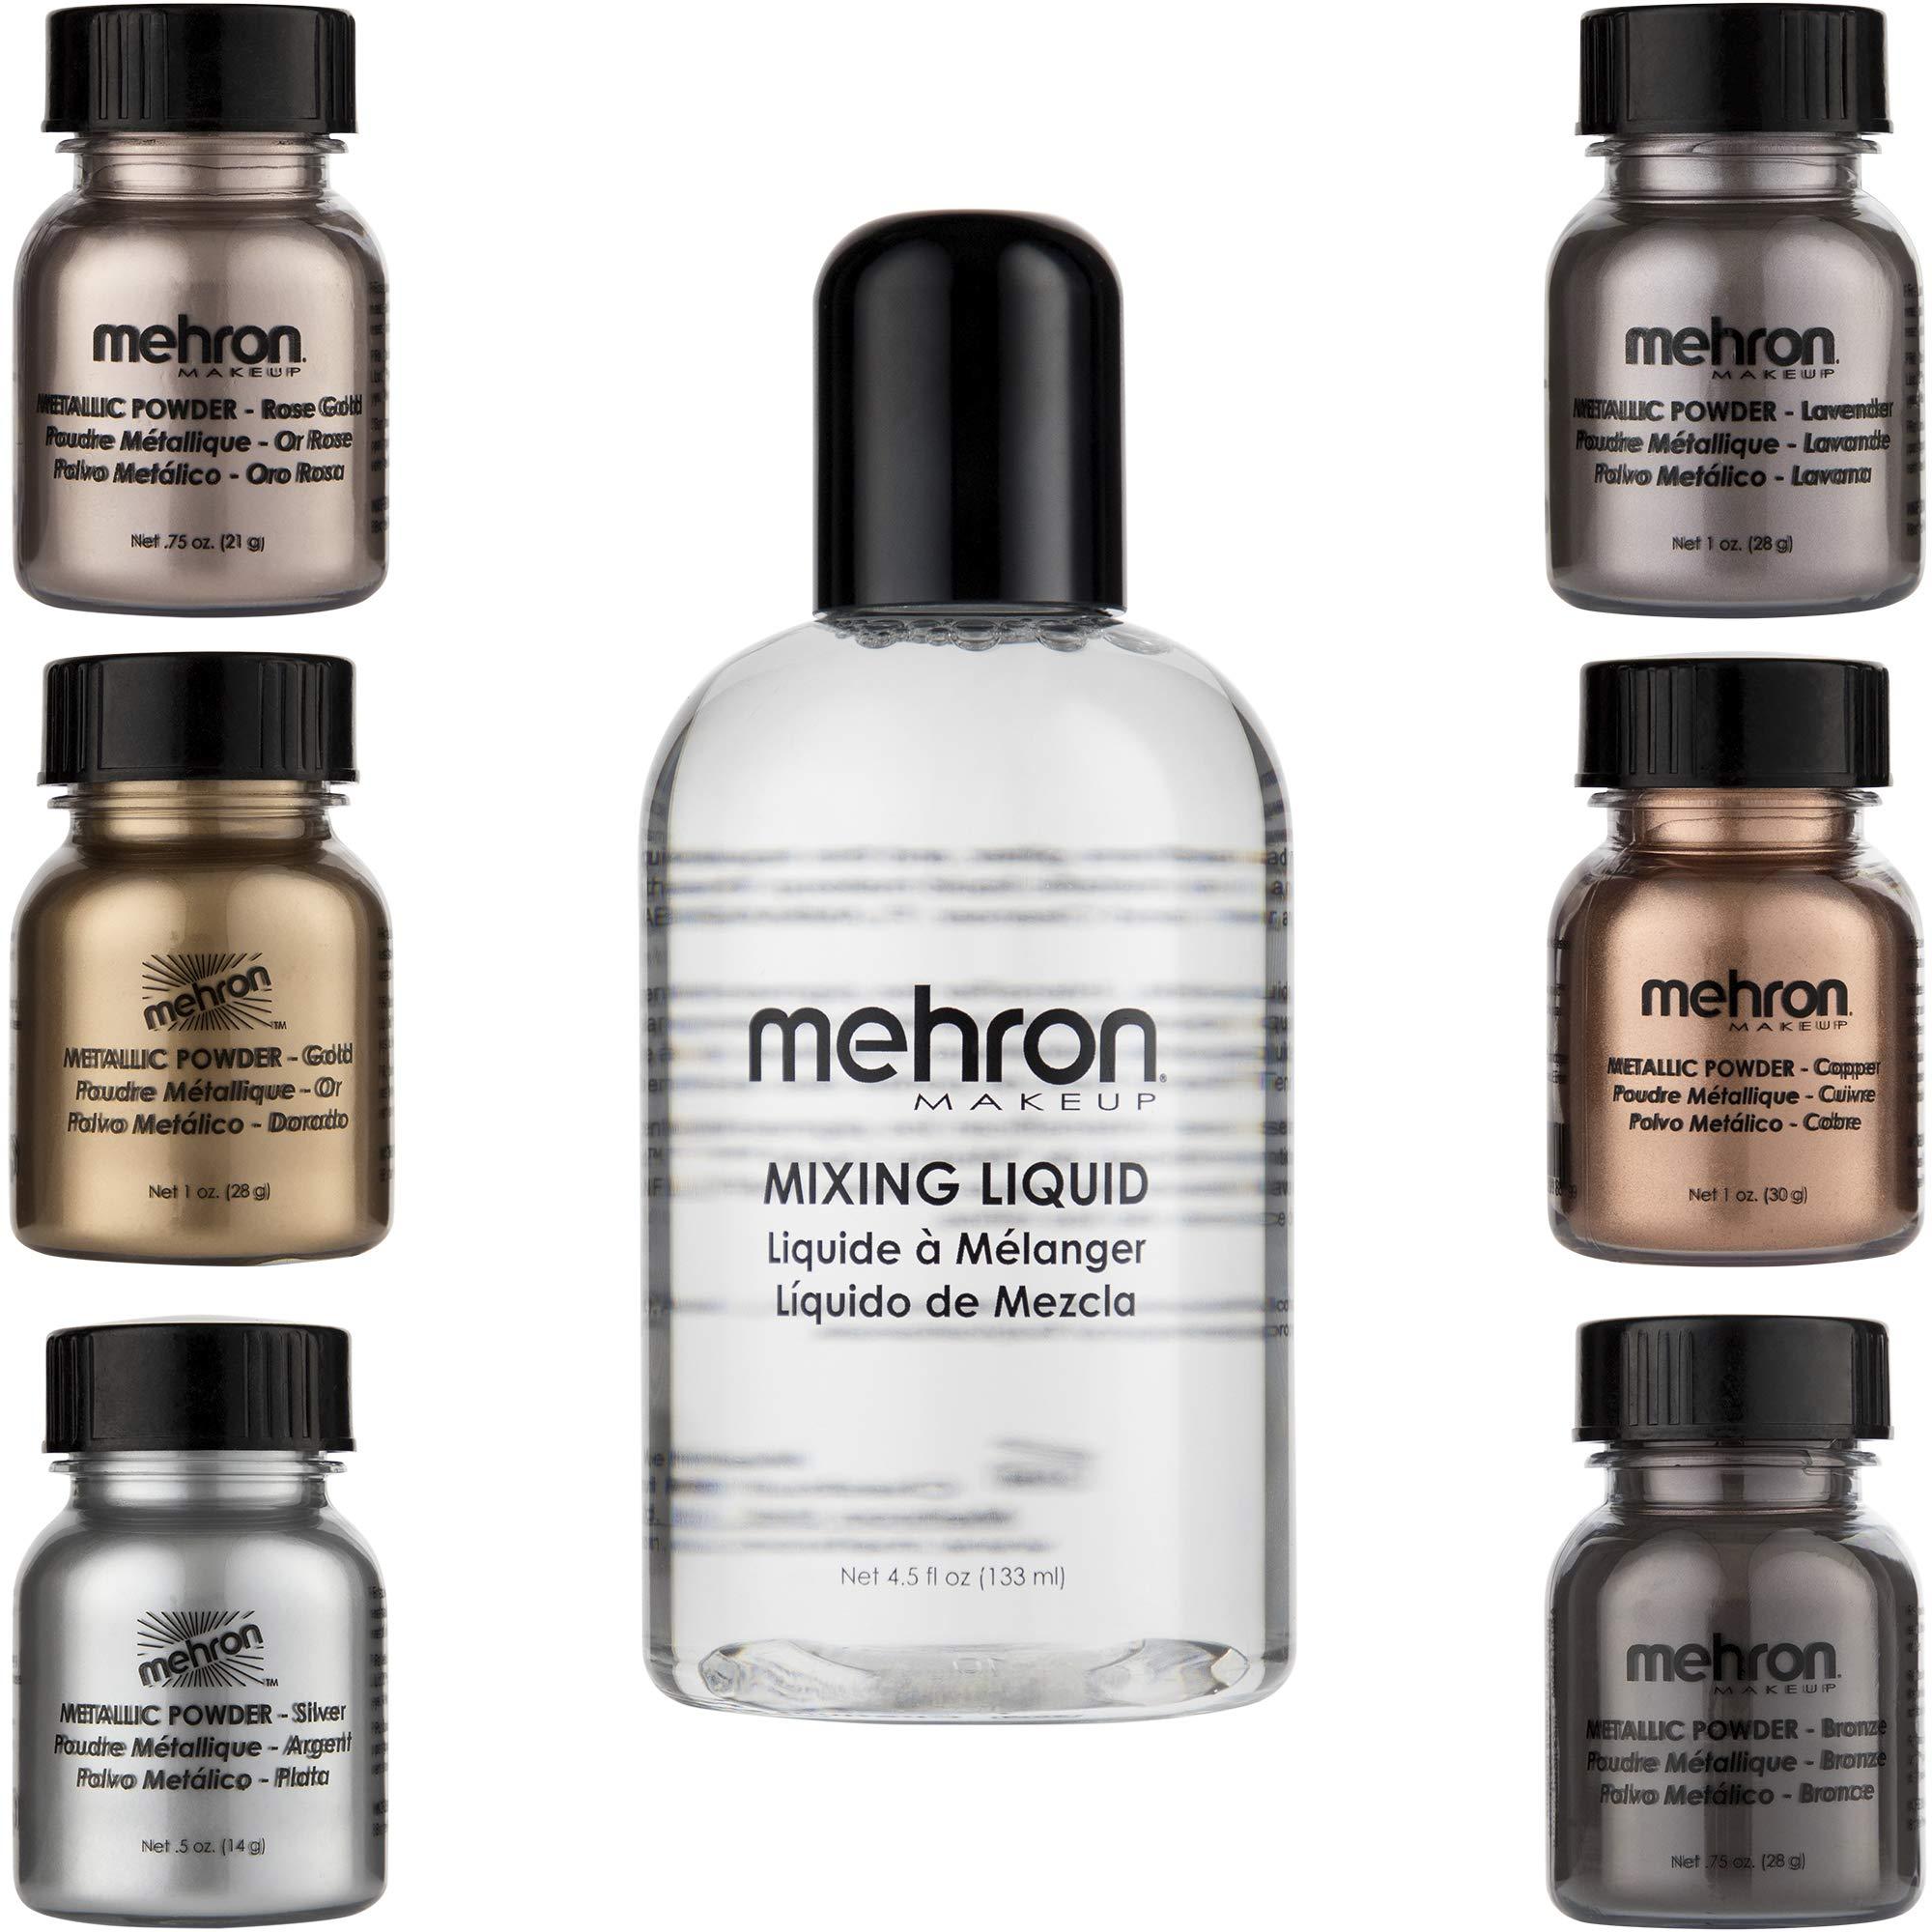 Mehron Makeup Holiday Shimmer Gift Set (6 Metallic Powders) (Mixing Liquid Included)